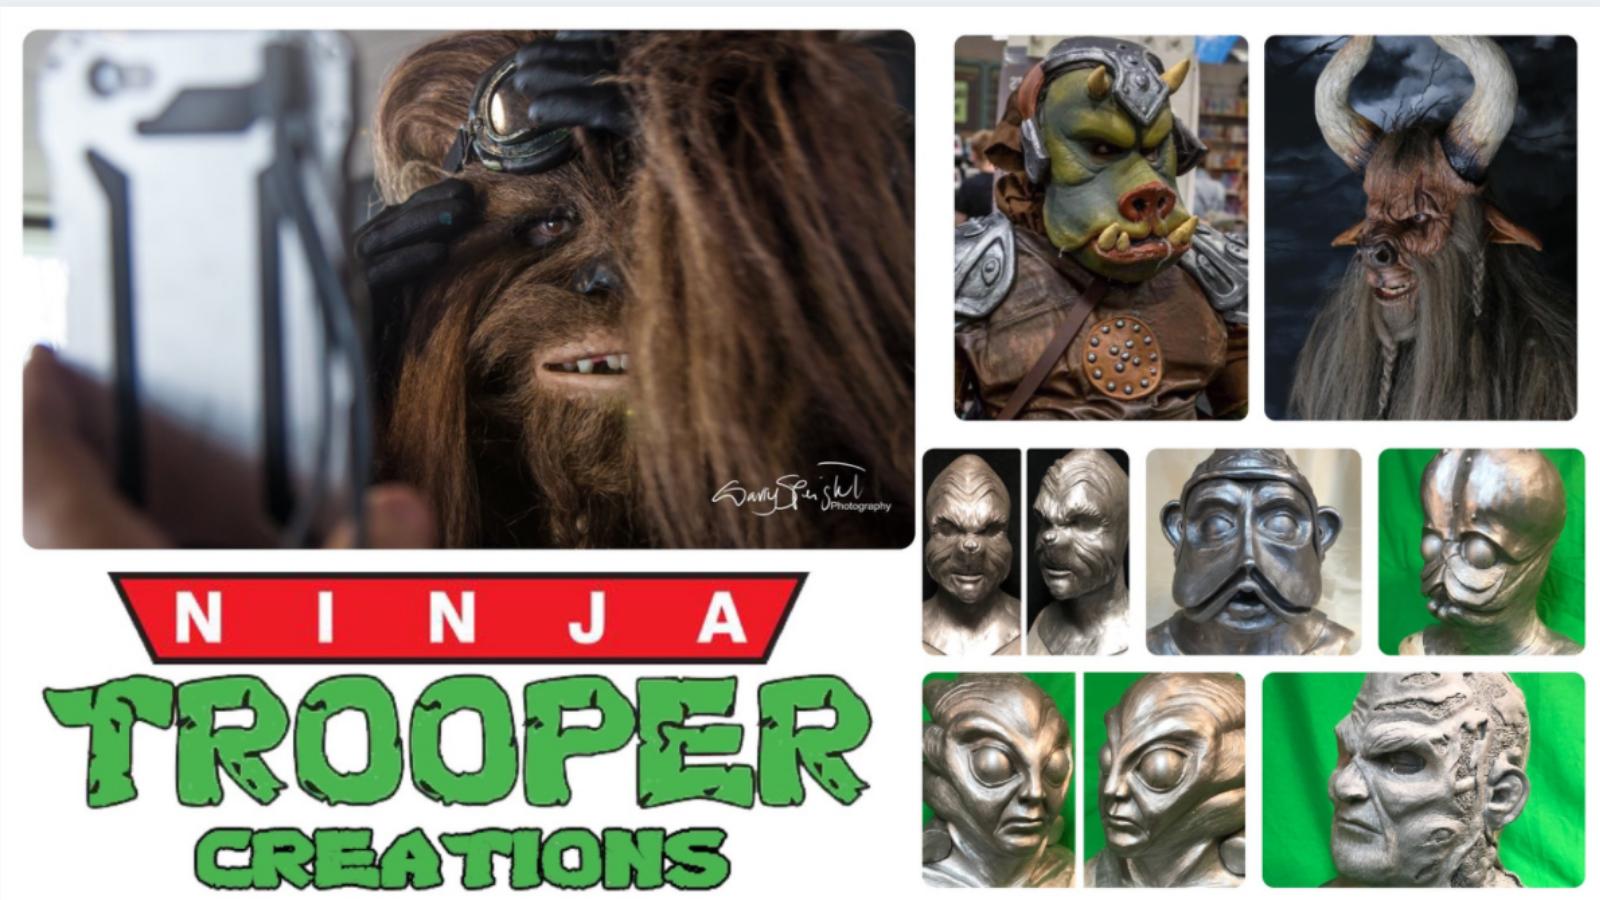 Ninja Trooper Creations